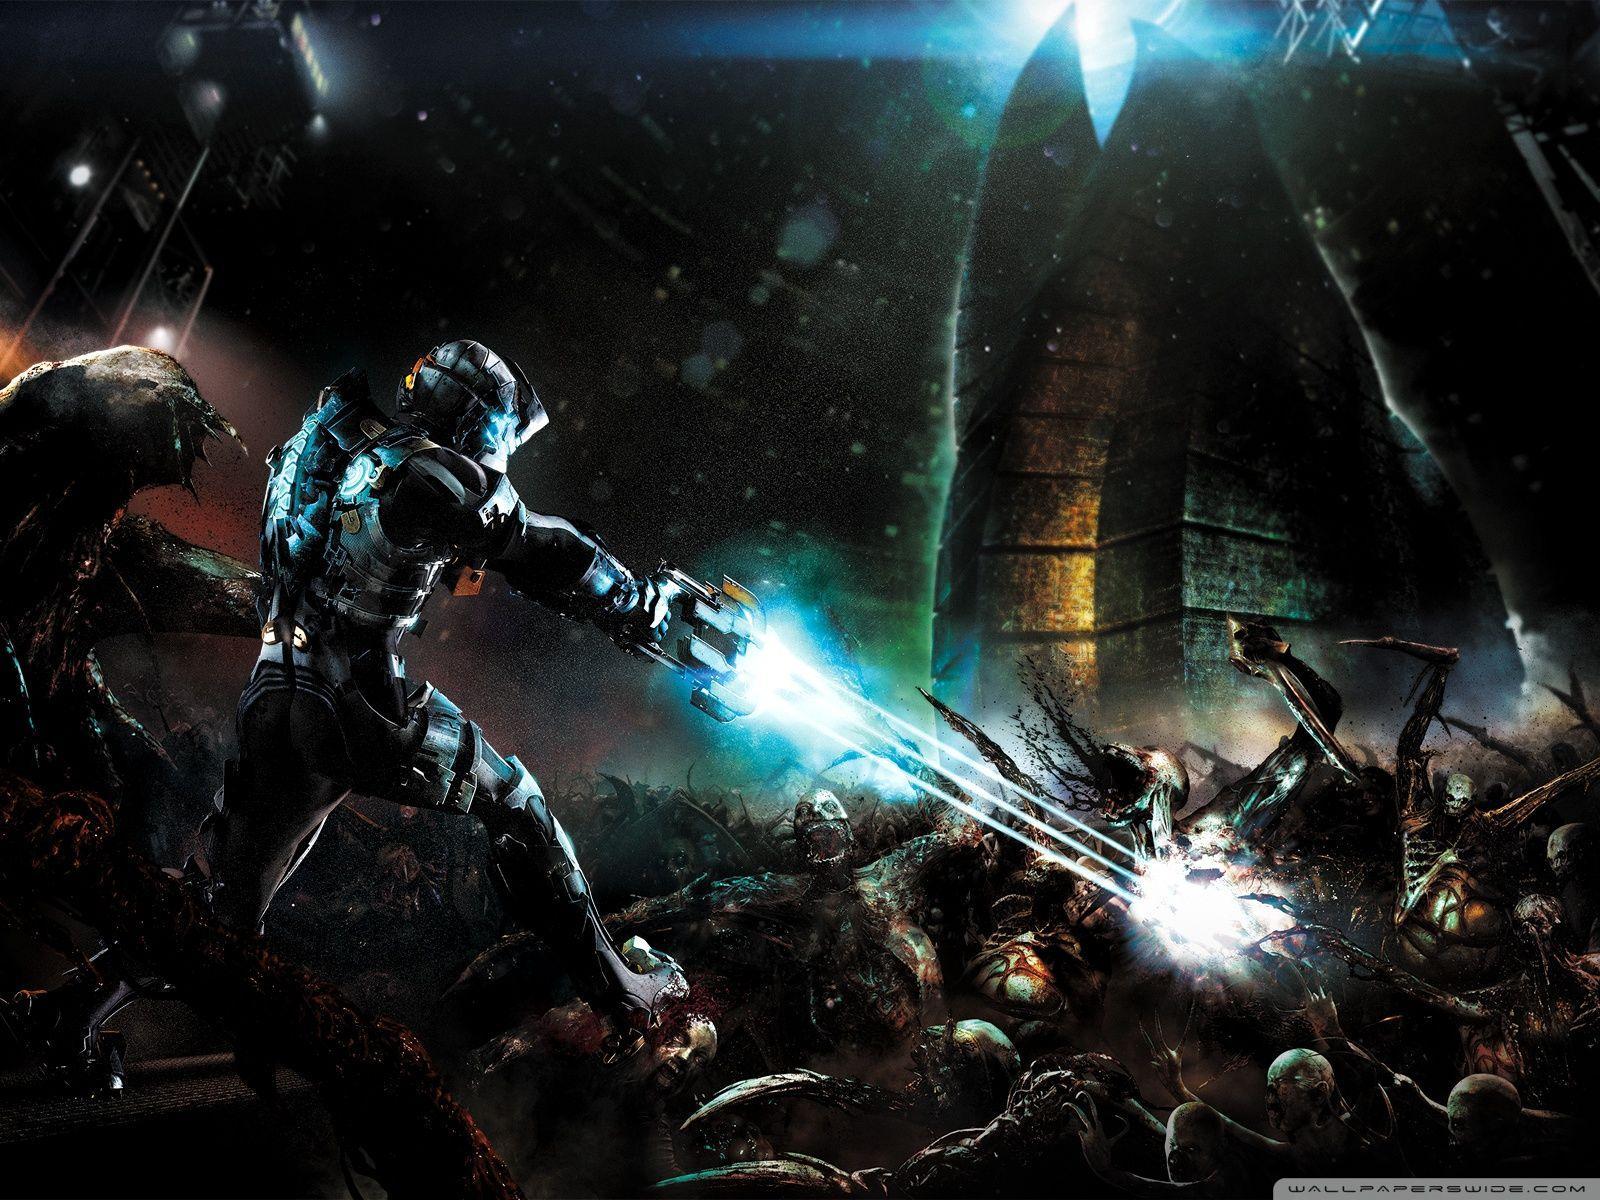 4k Dead Space 2 Wallpapers Top Free 4k Dead Space 2 Backgrounds